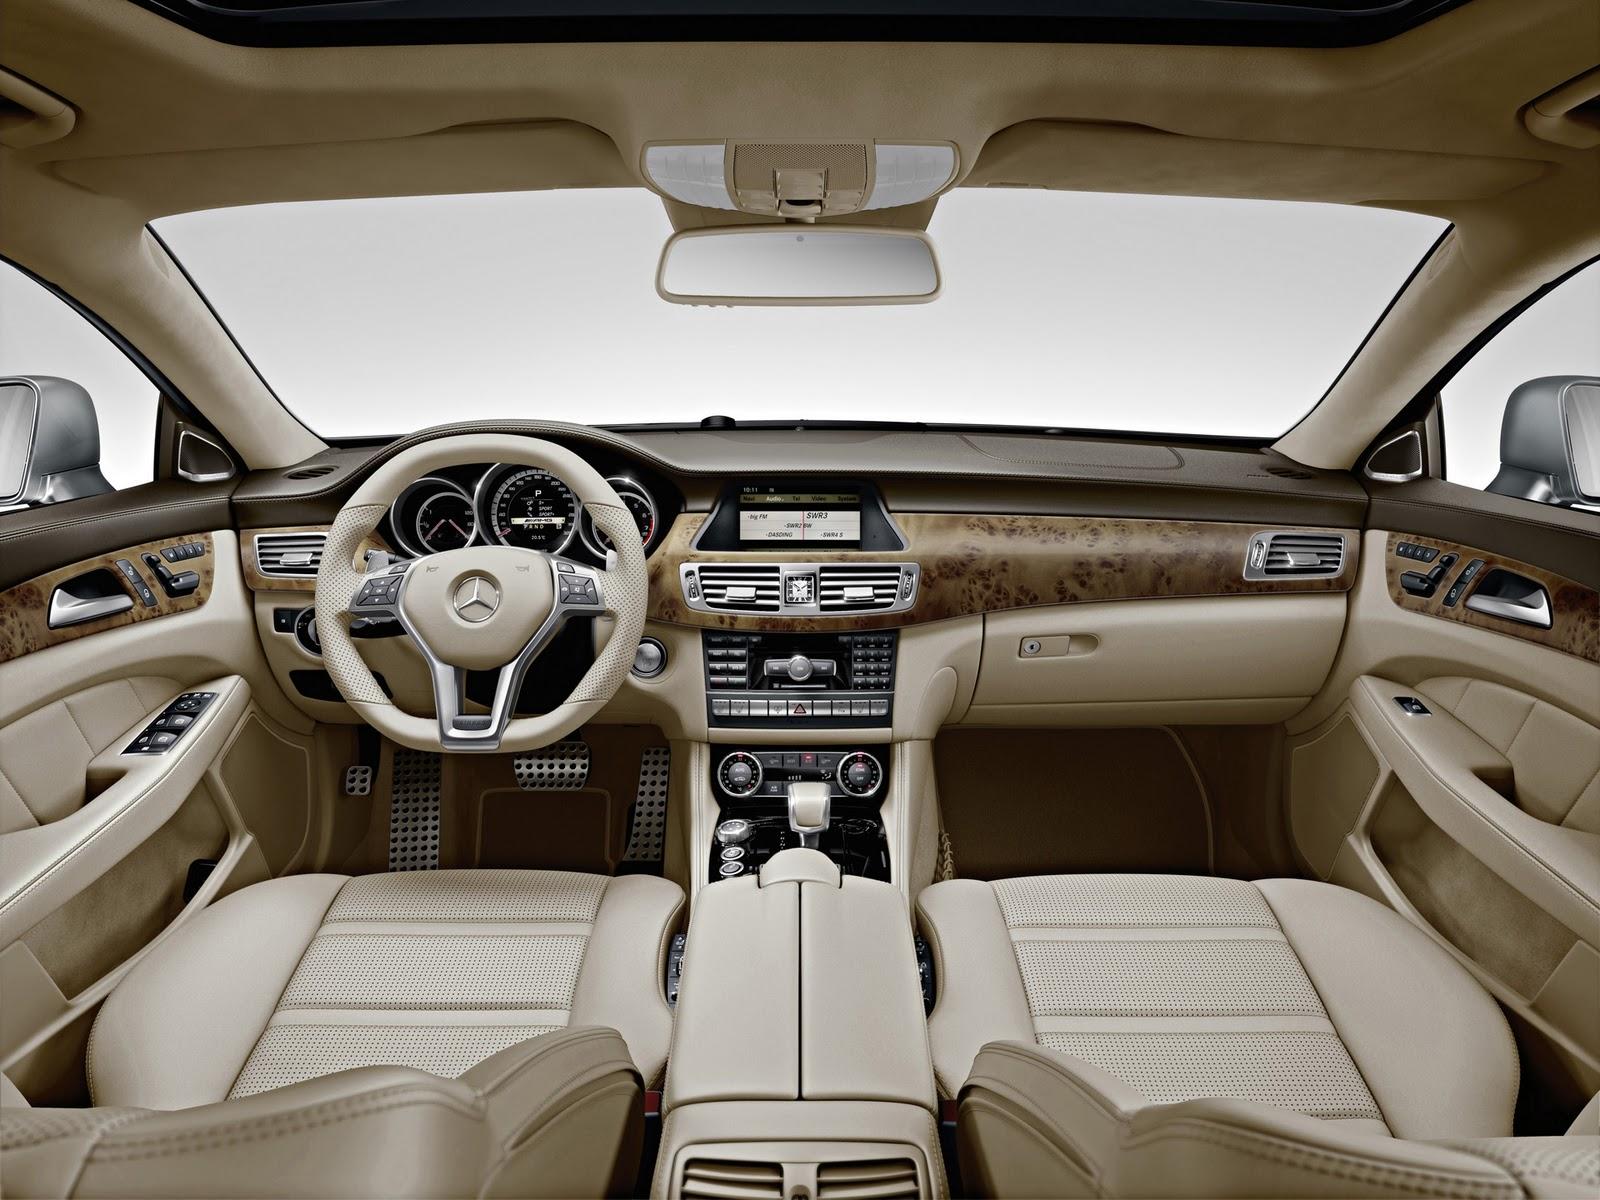 http://1.bp.blogspot.com/_viCh1SFyGrA/TO1uxaB5rsI/AAAAAAAAAJY/h7J_mStN2e4/s1600/2011-Mercedes-Benz-CLS-63-AMG-Dashboard-2-1920x1440.jpg